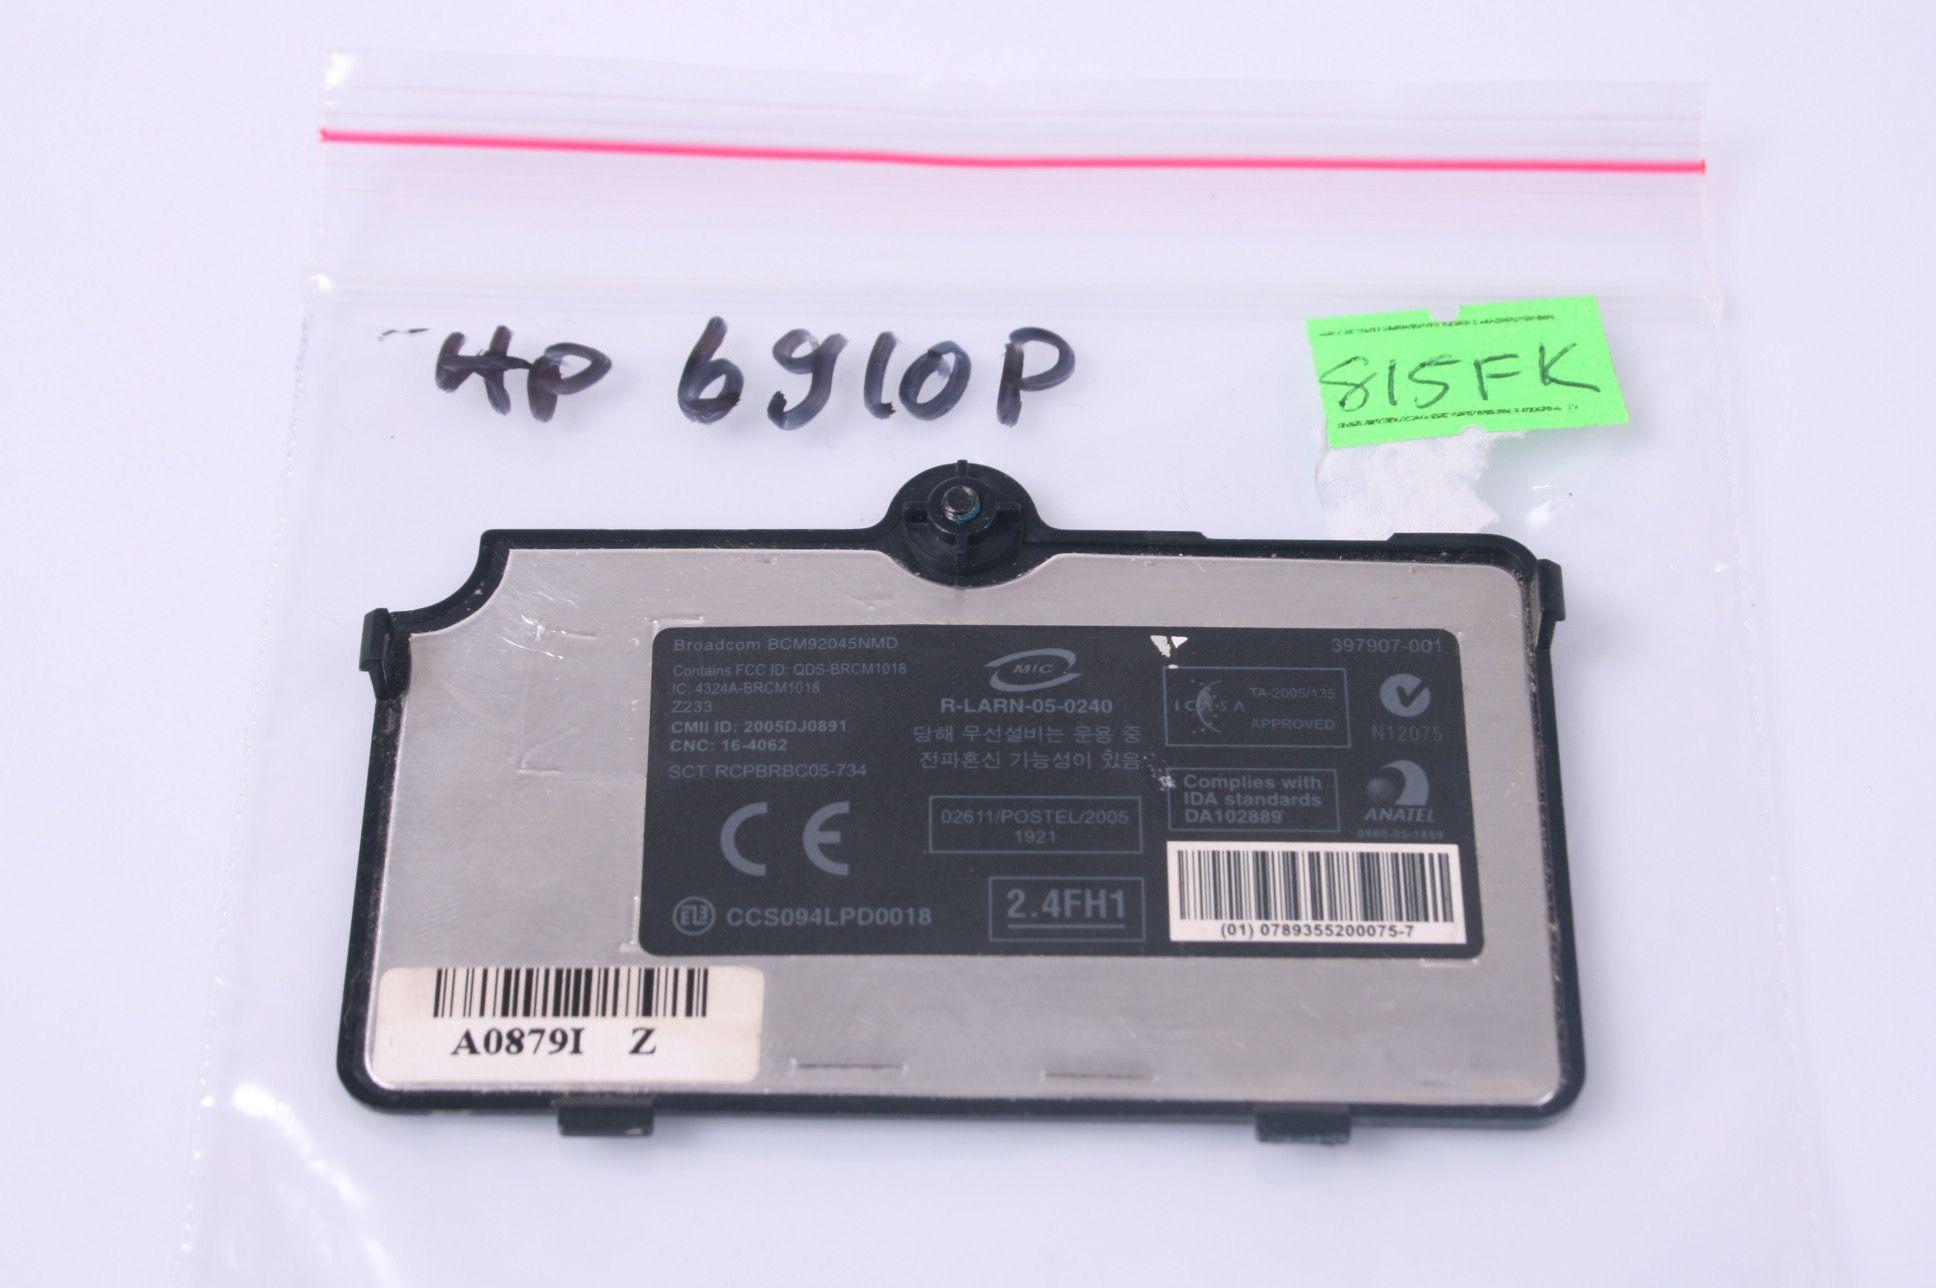 HP COMPAQ 6910P Memory Cover 397907-001